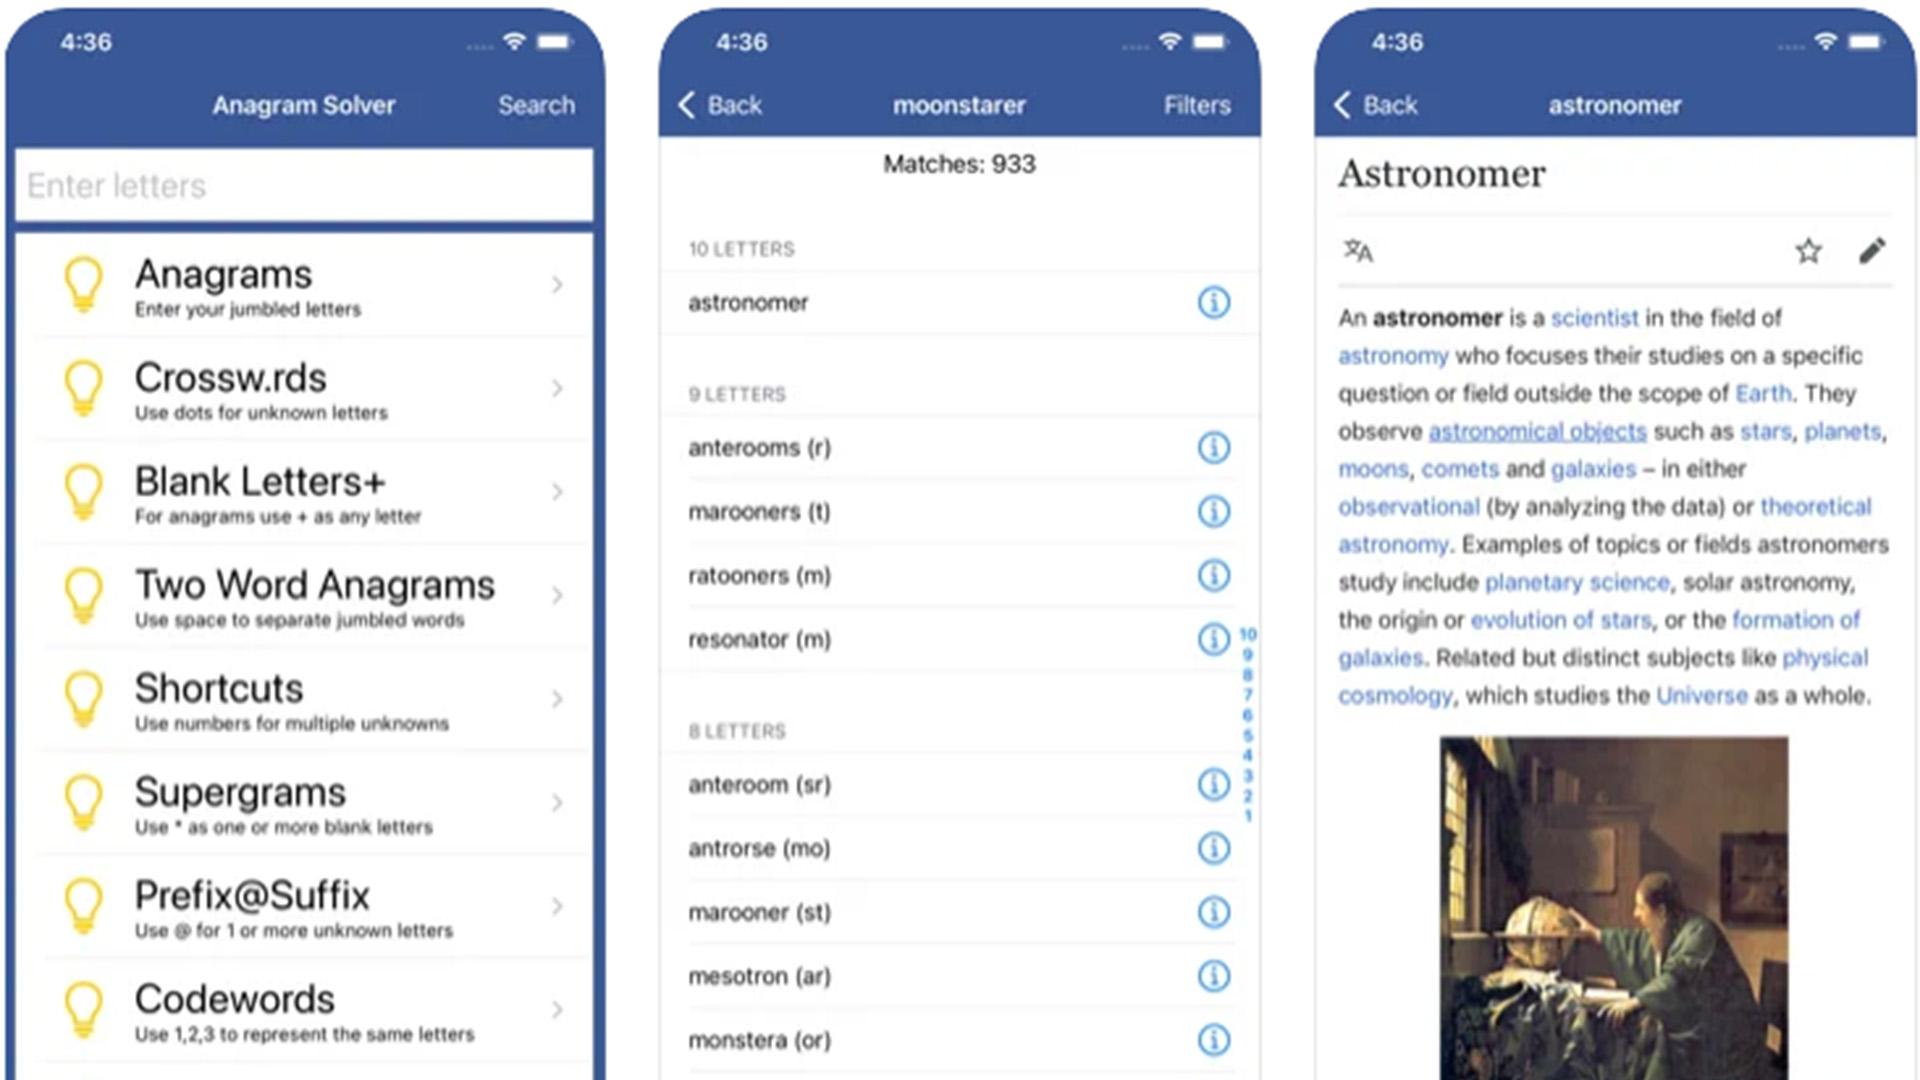 Anagram Solver iOS screenshot 2021